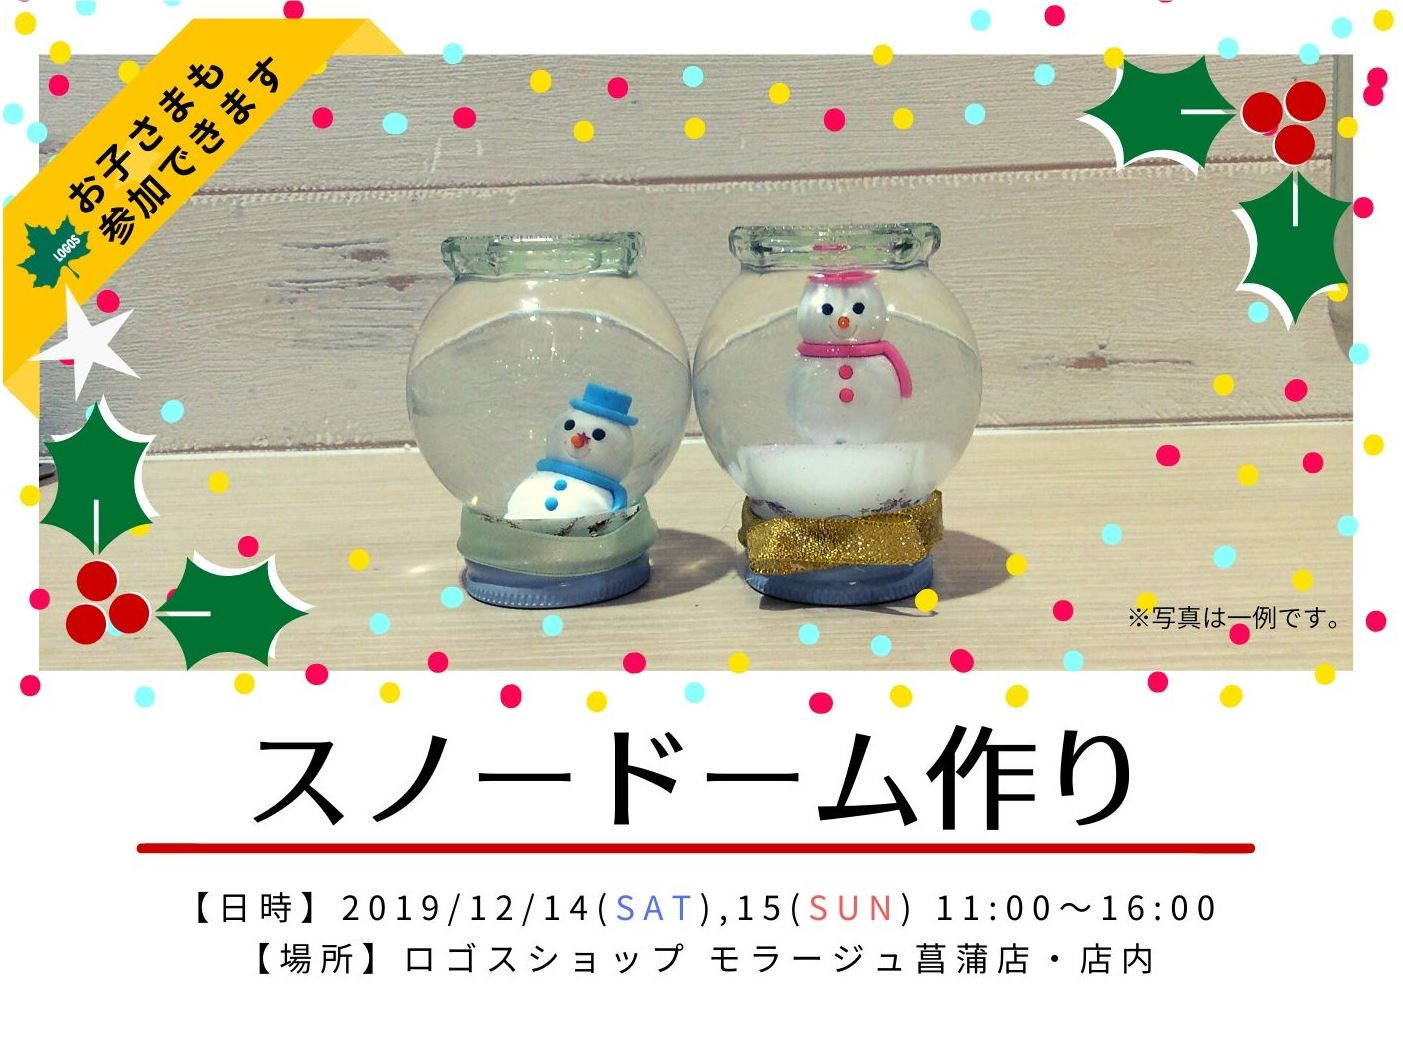 【LOGOS SHOP埼玉モラージュ菖蒲店】スノードーム作り